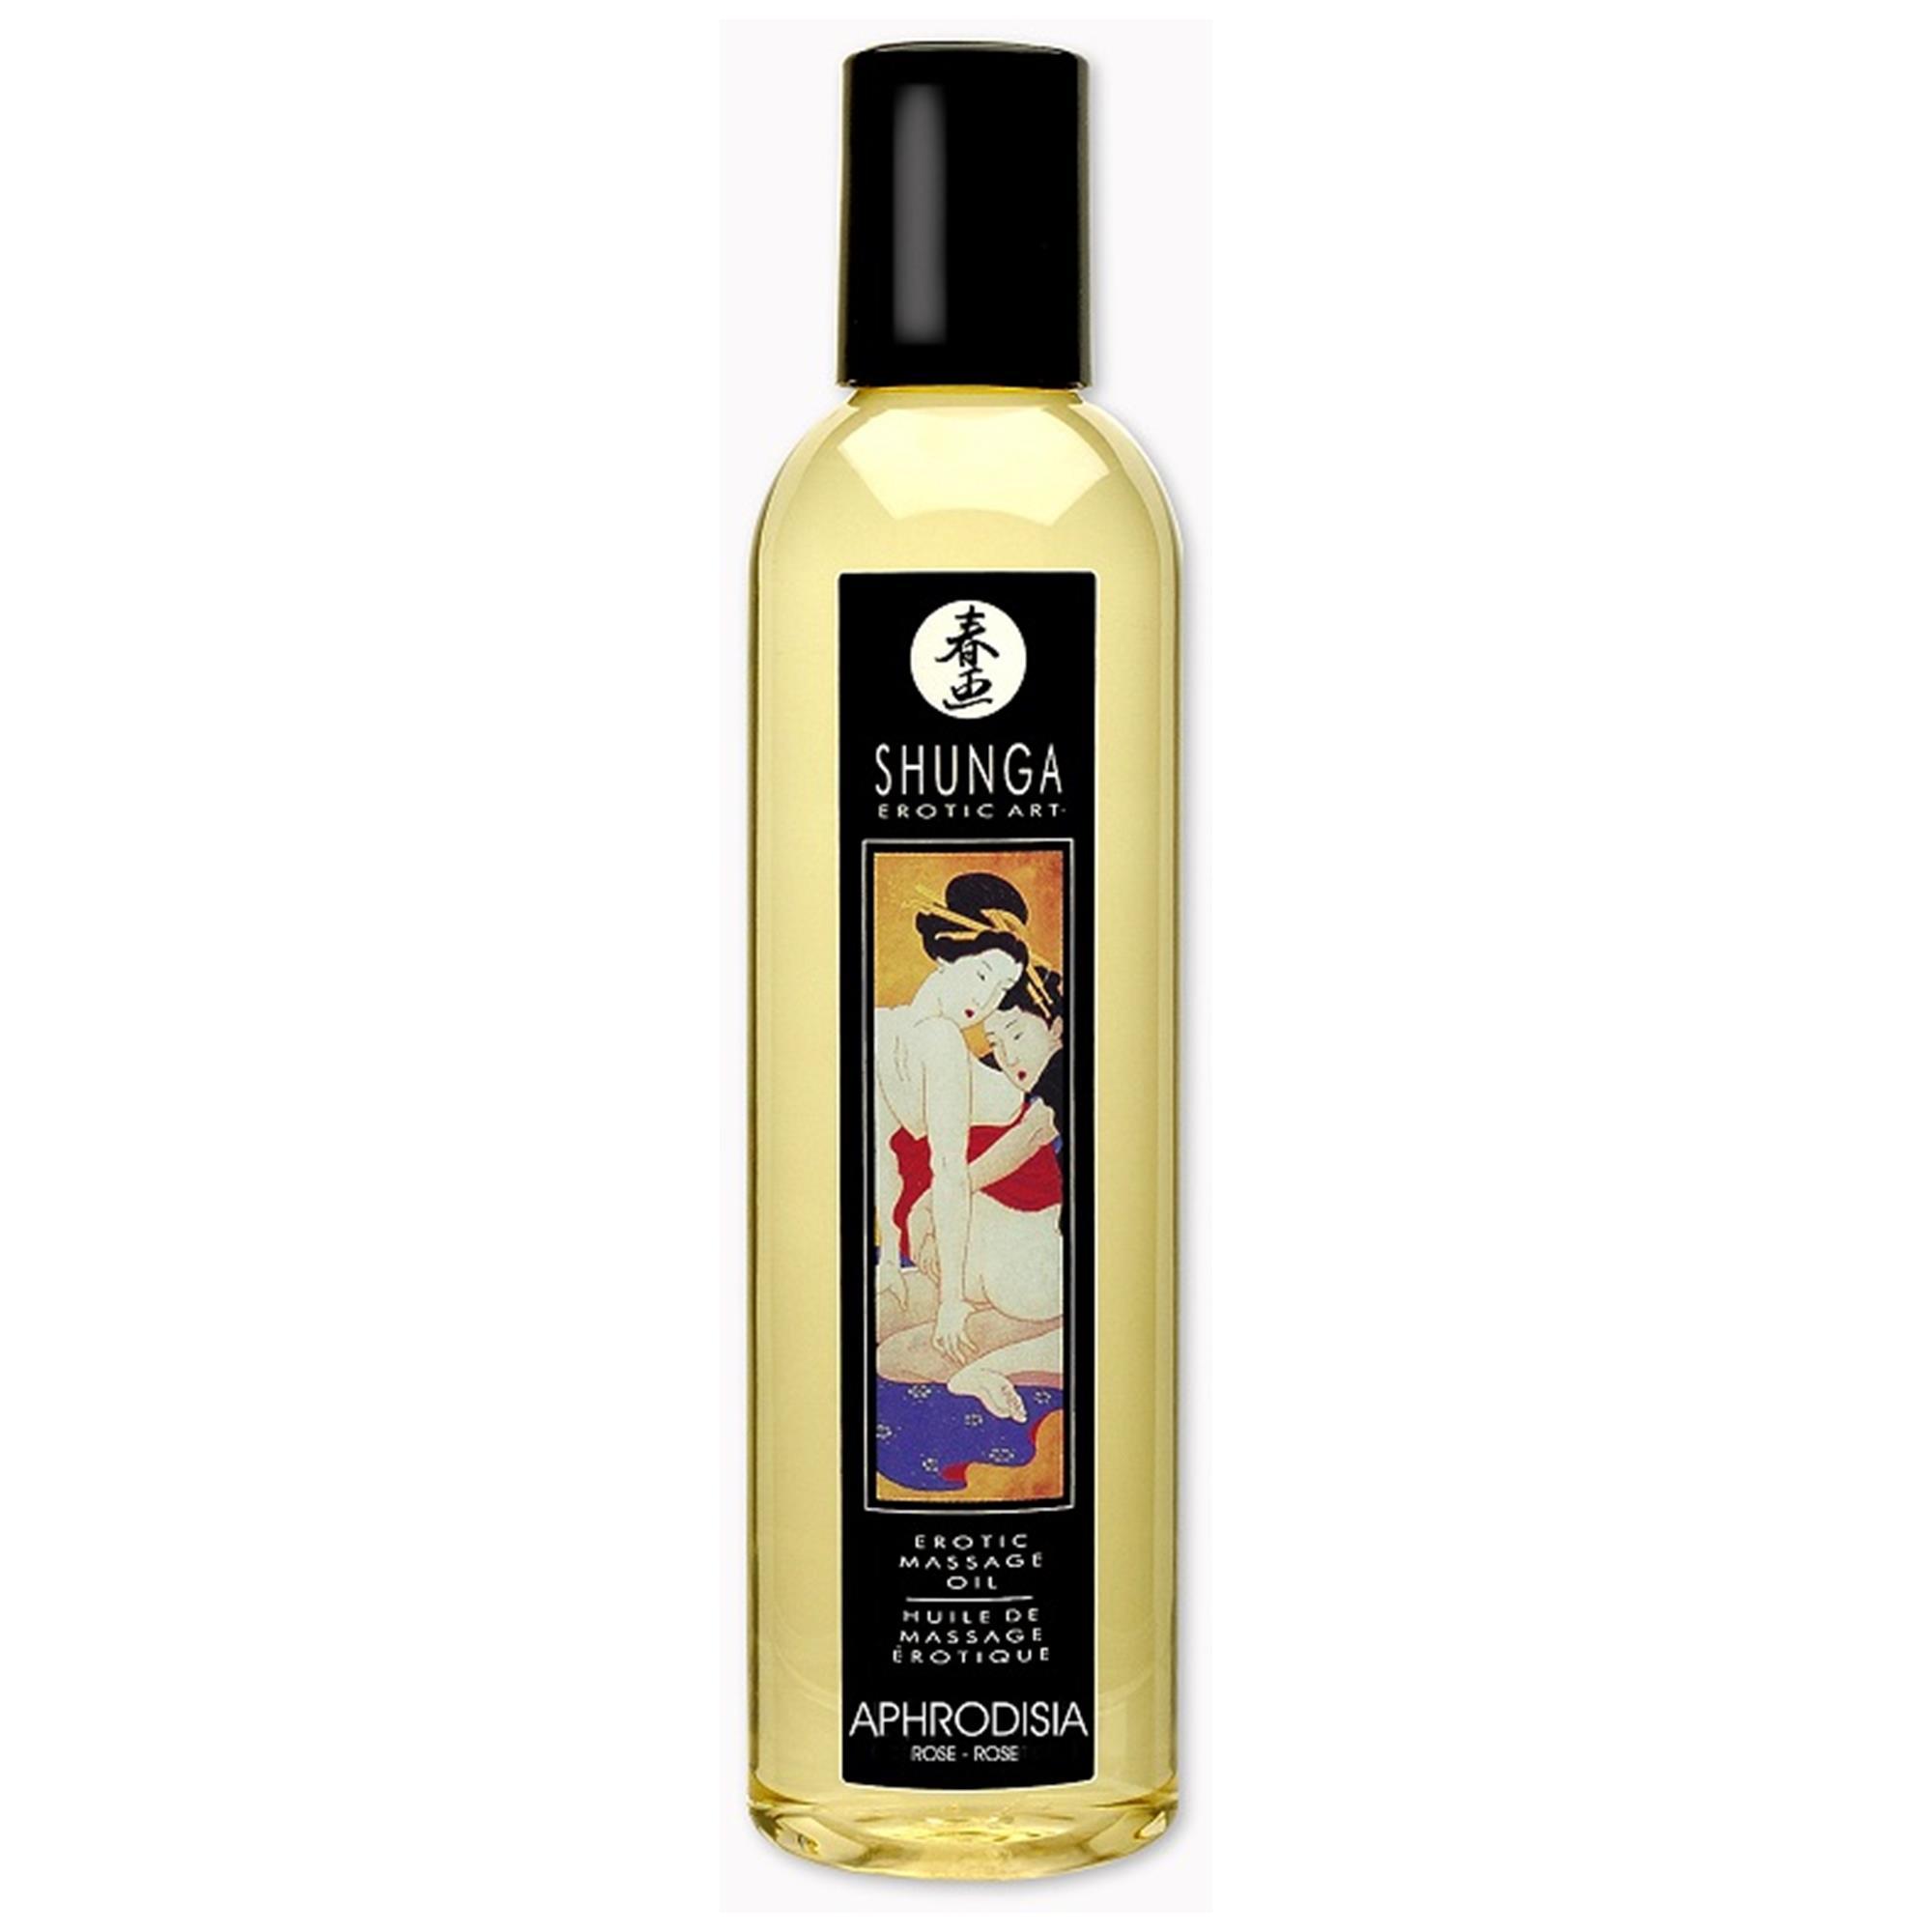 Shunga Massage Oil Aphrodisia (Rose) | Apotek, Massage, Massageolja | Intimast.se - Sexleksaker